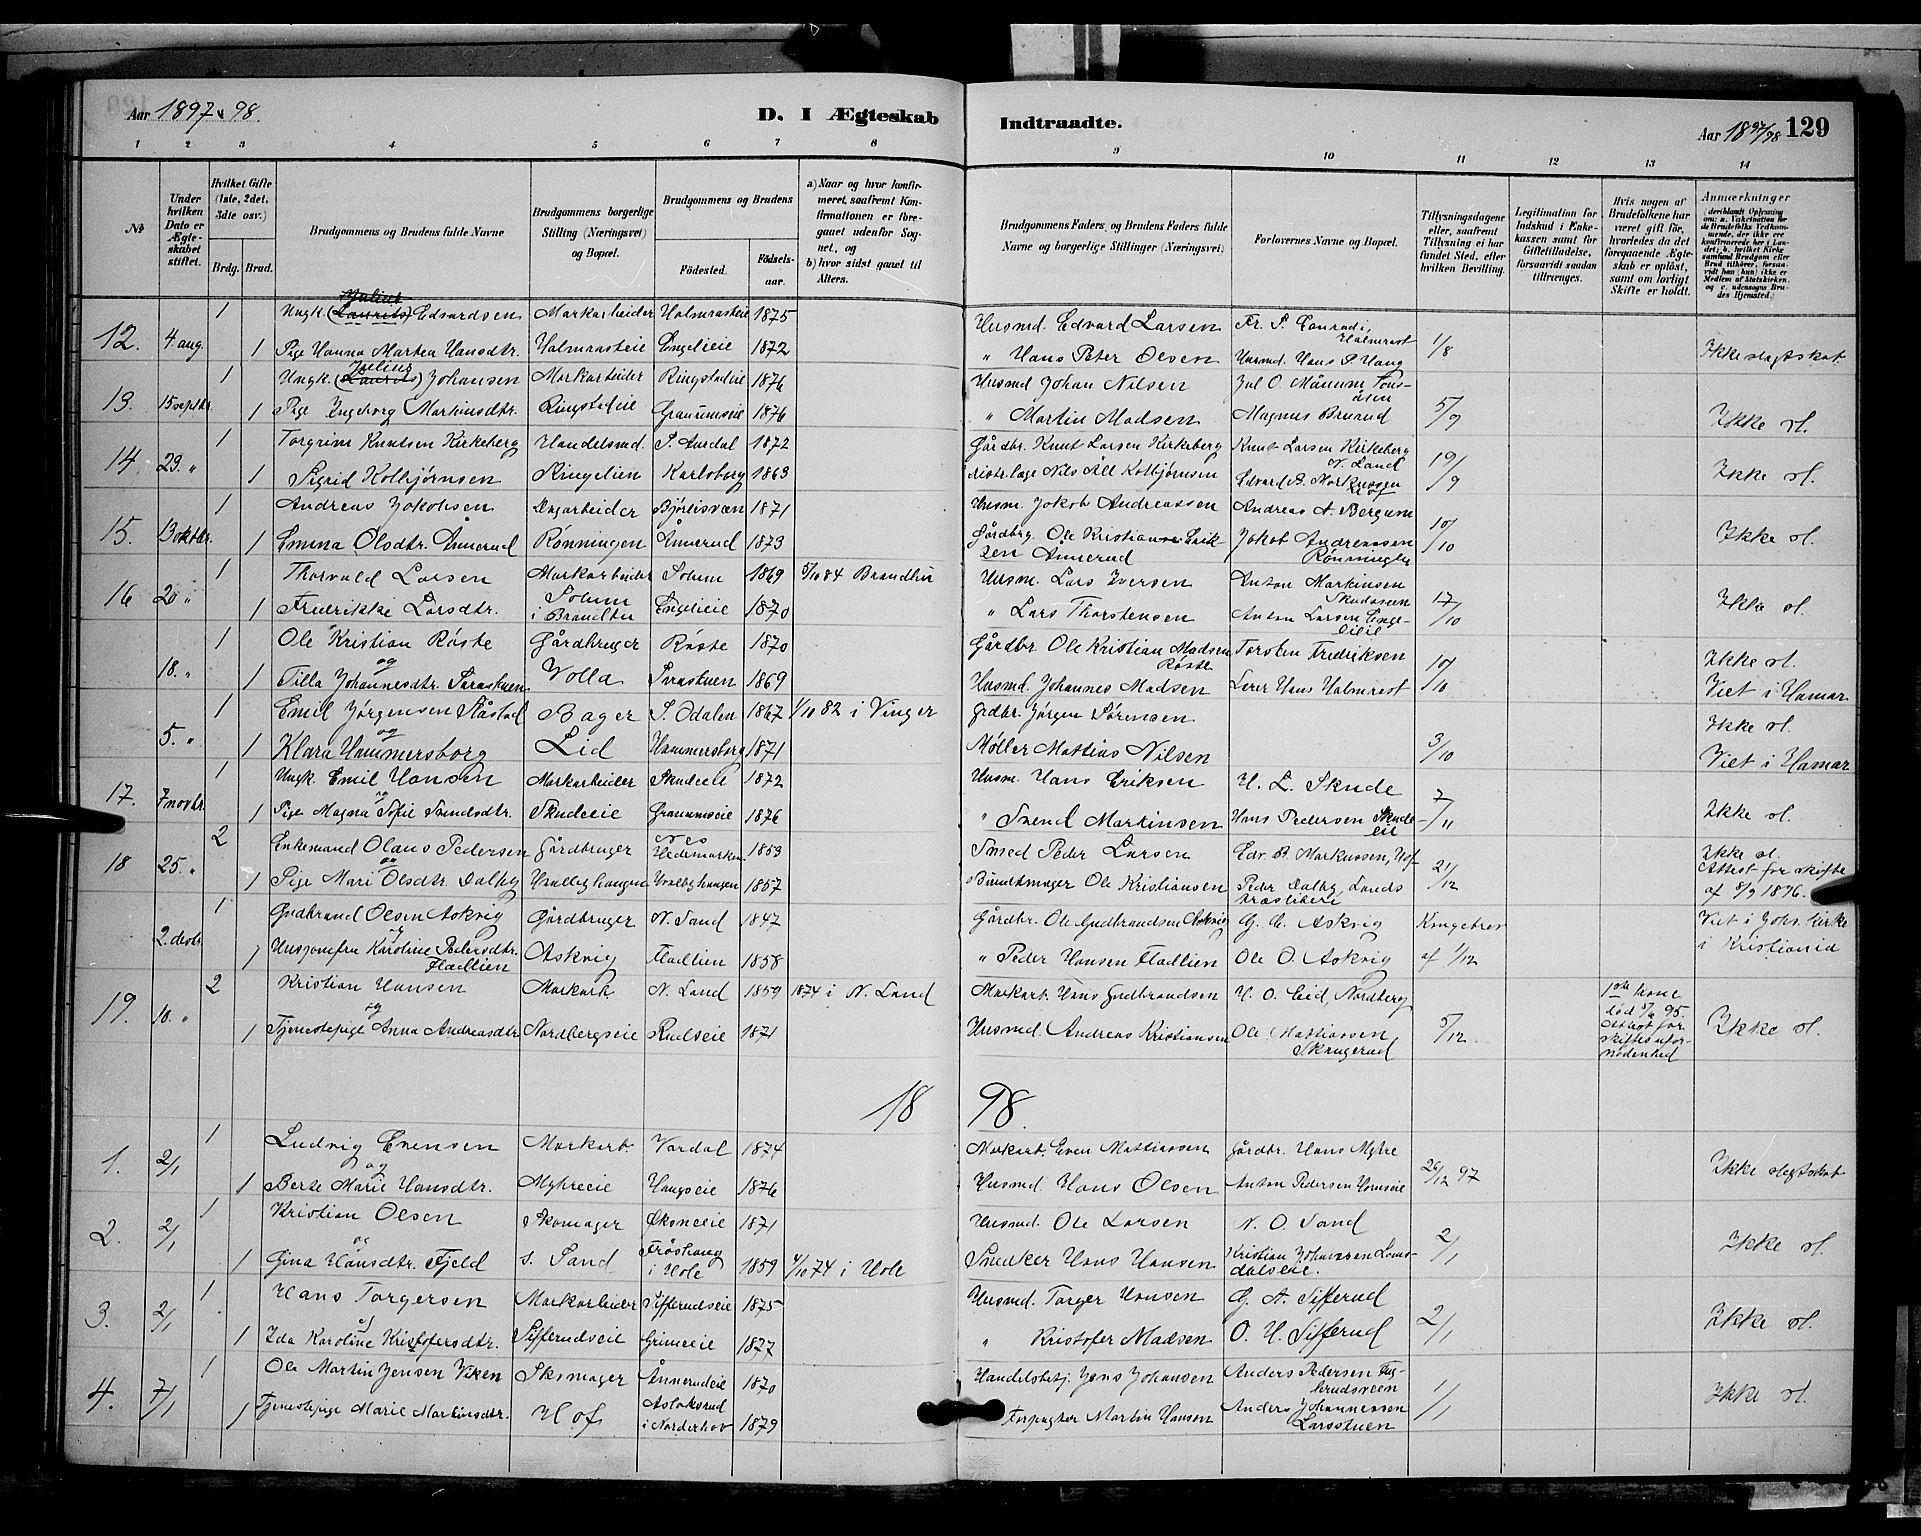 SAH, Søndre Land prestekontor, L/L0002: Klokkerbok nr. 2, 1884-1900, s. 129